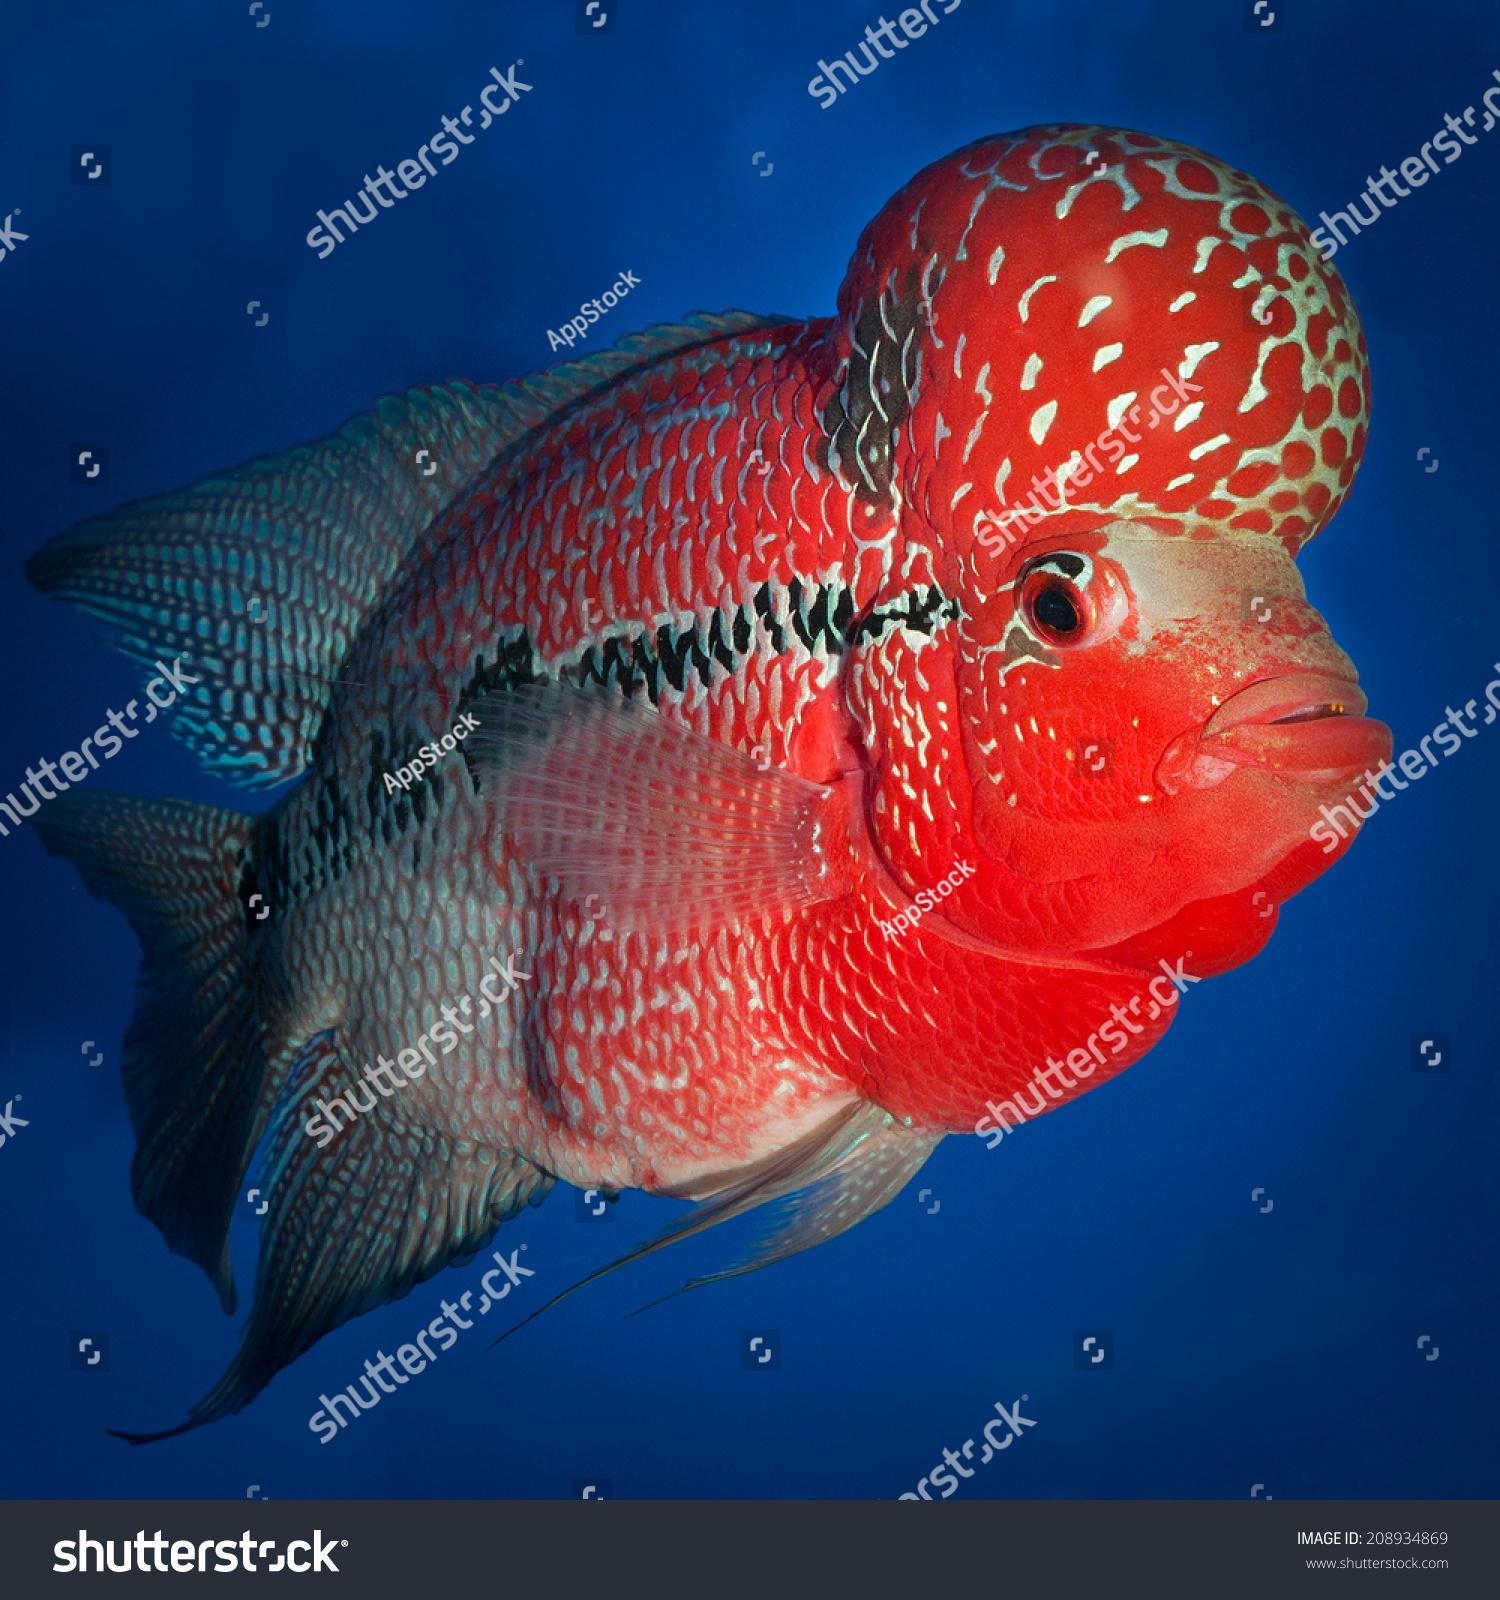 Flowerhorn Cichlid Fish On Blue Background Stock Photo (Royalty Free ...